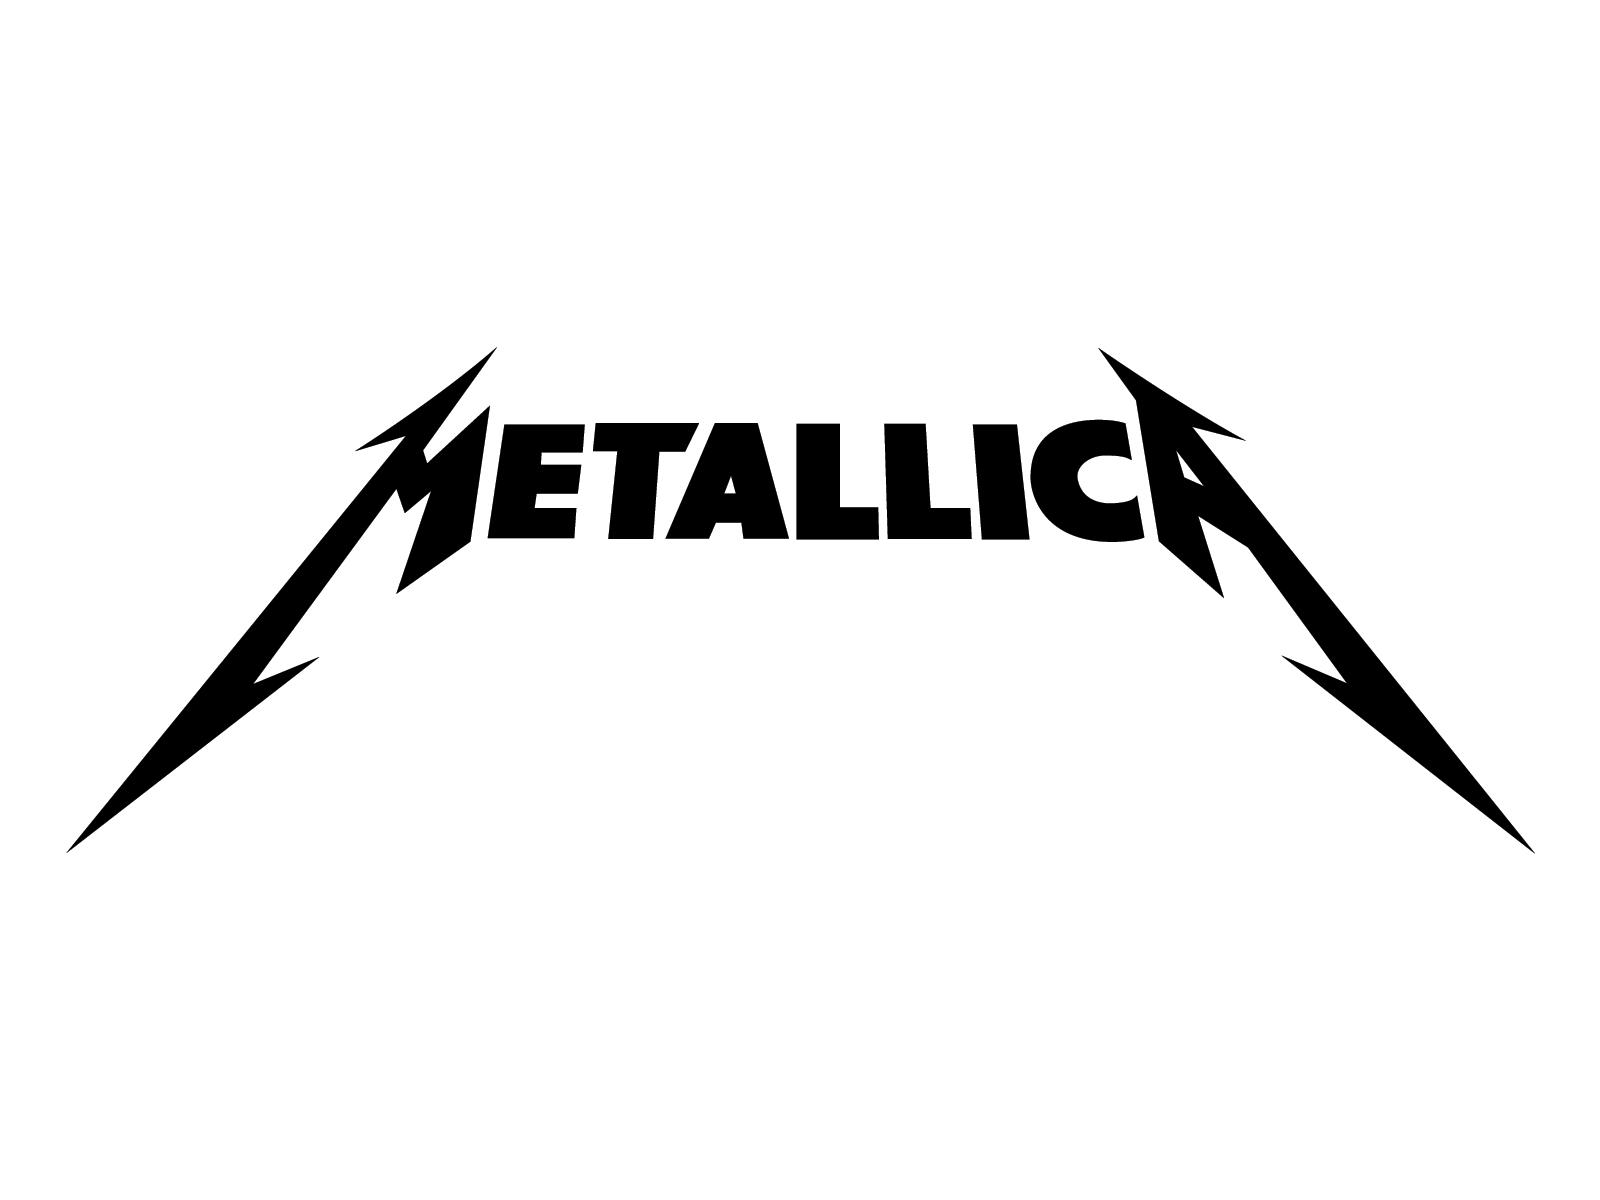 Metallica logo wallpaper 1600x1200